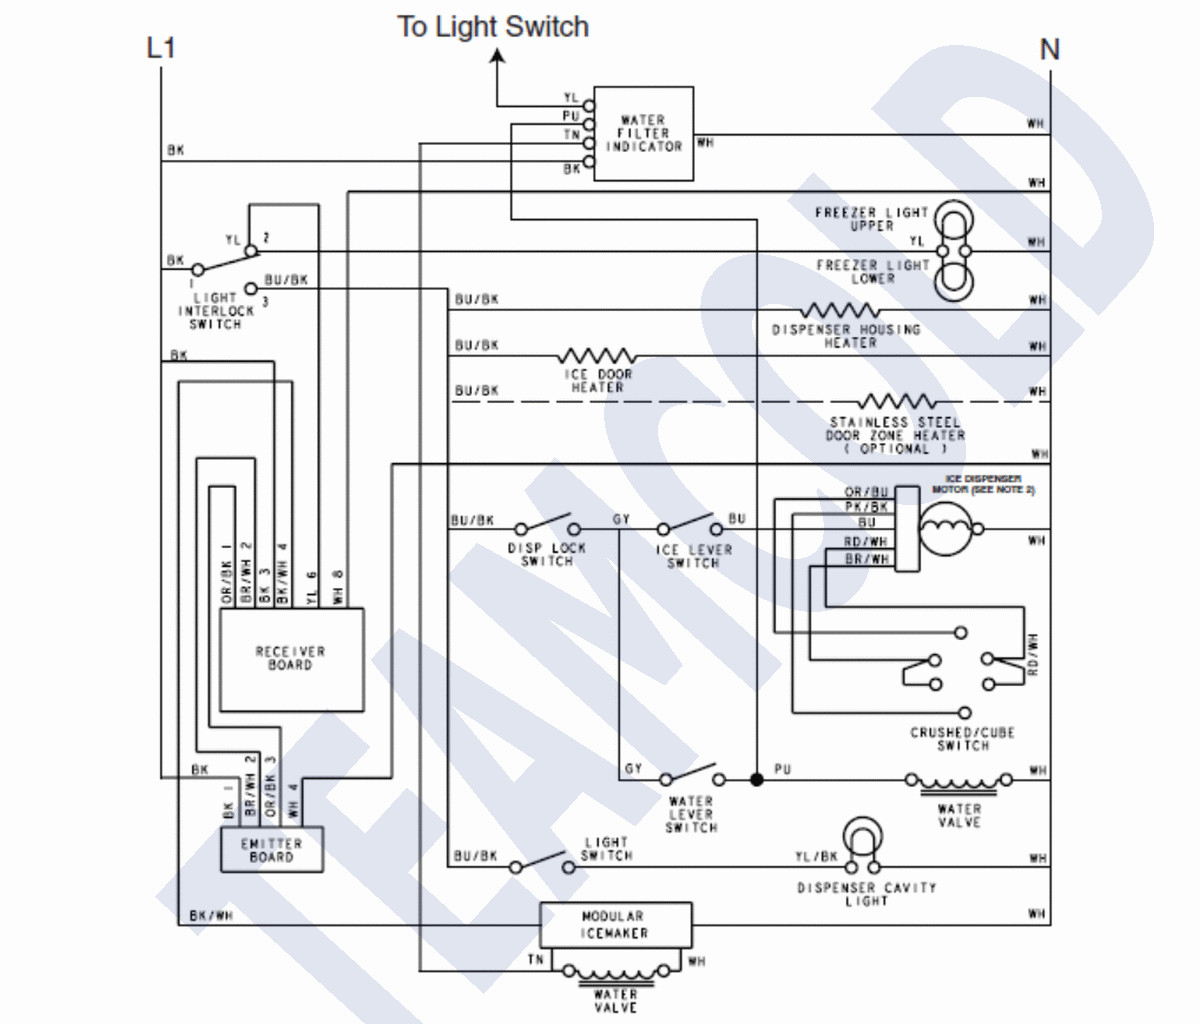 EF_2910] Wiring Diagram As Well Whirlpool Ice Maker Wiring Diagram As Well  Download DiagramHison Rine Itis Gue45 Mohammedshrine Librar Wiring 101